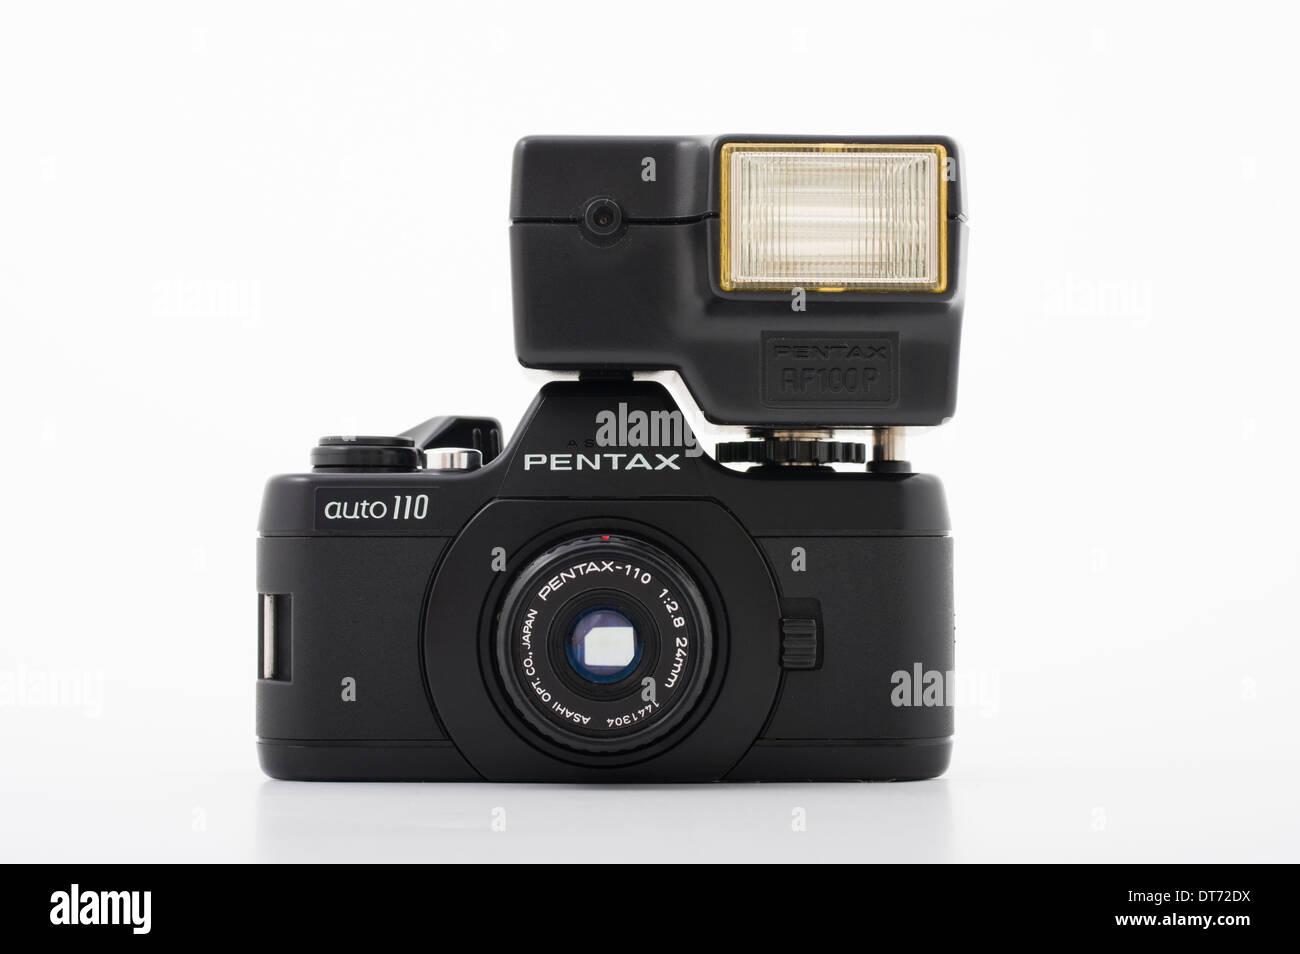 Pentax auto 110 film SLR camera using compact 110 film - Stock Image